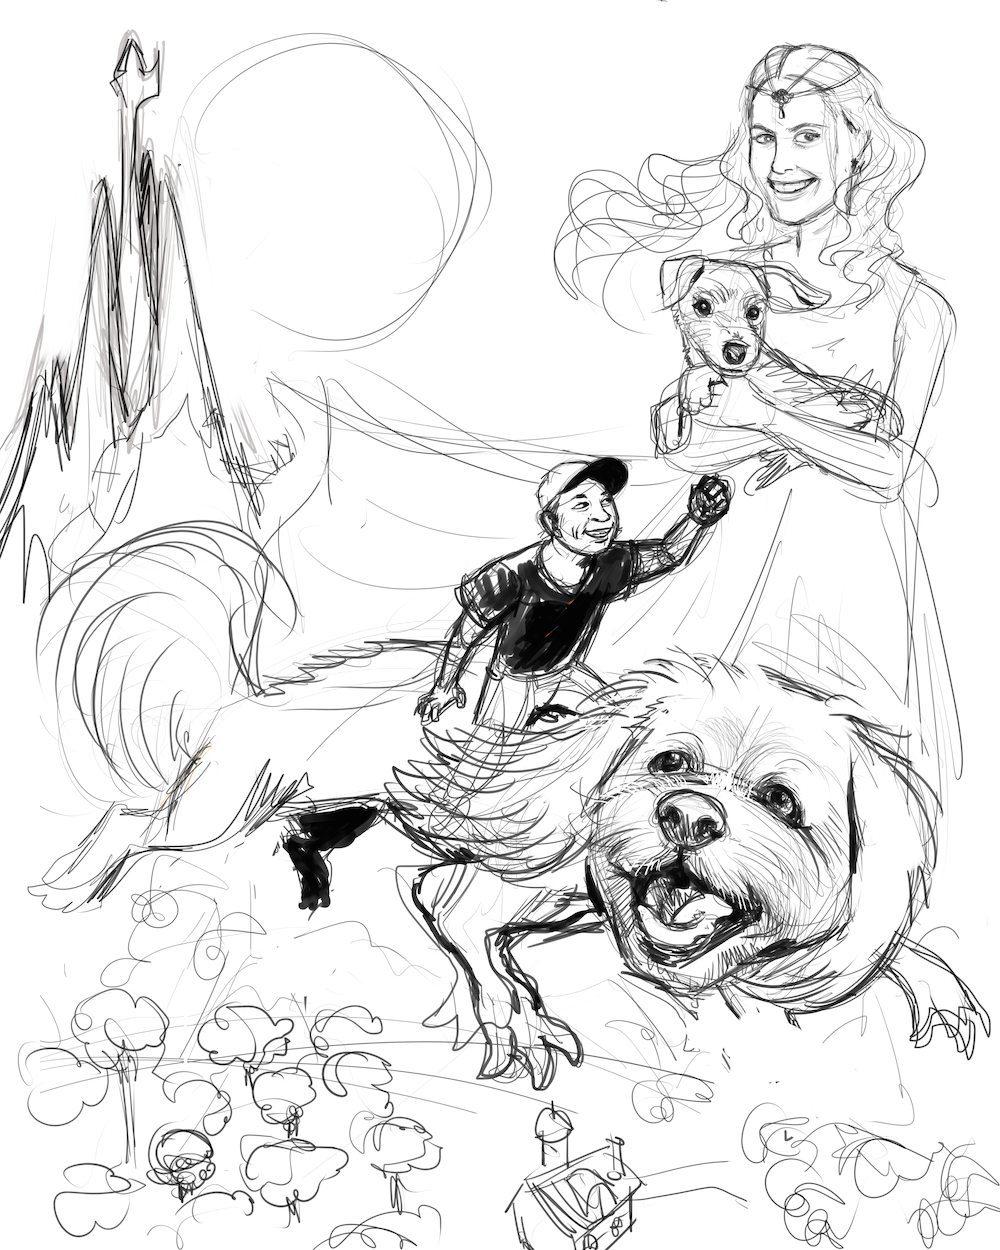 Draft of NeverEnding Story Fan Art by BenDX